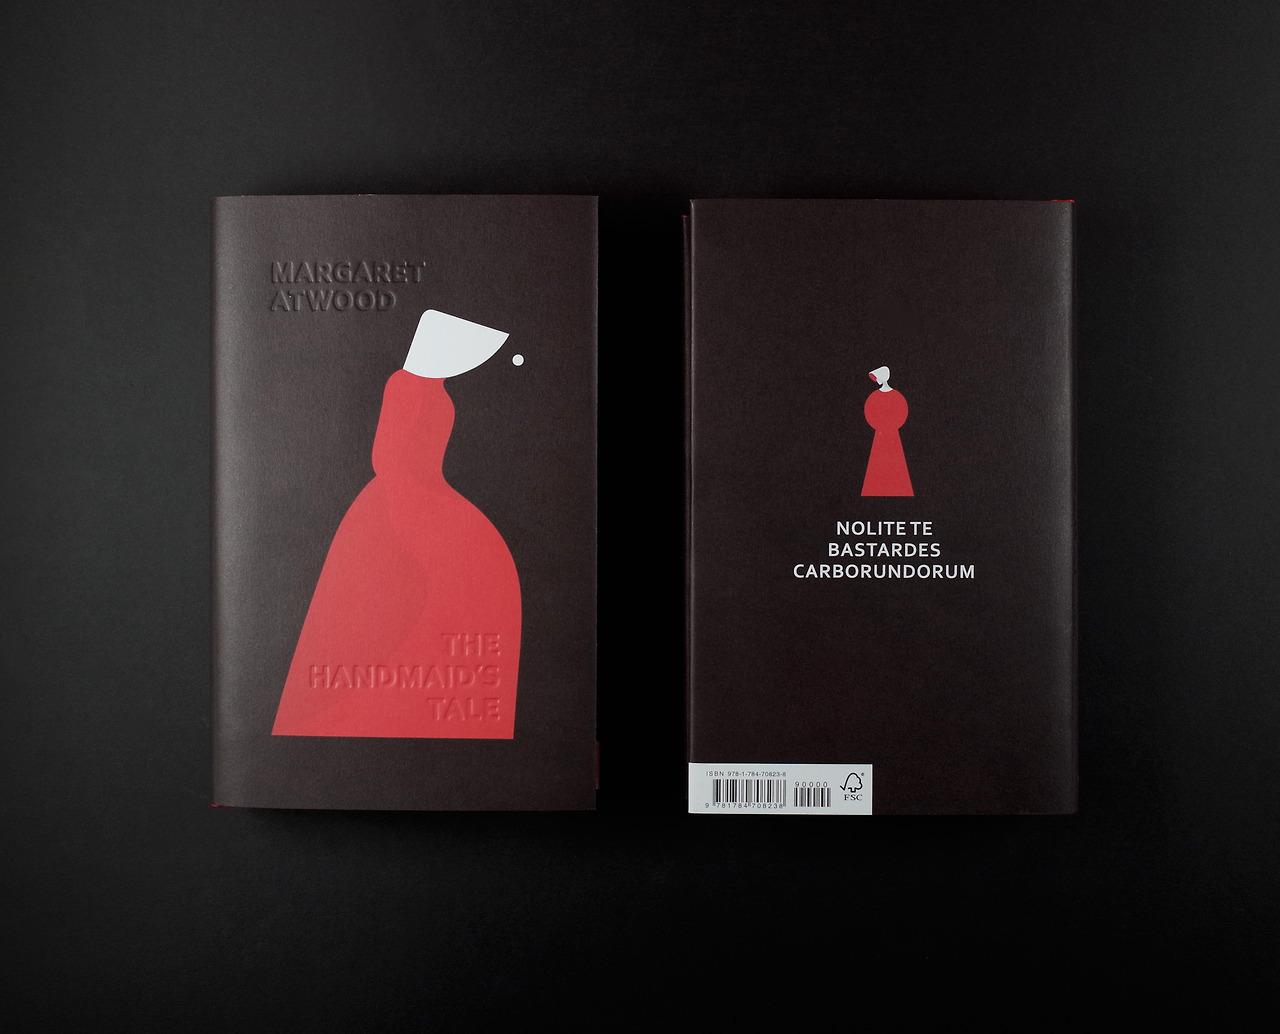 noma-bar-handmaids-tale-margaret-atwood-2.jpg